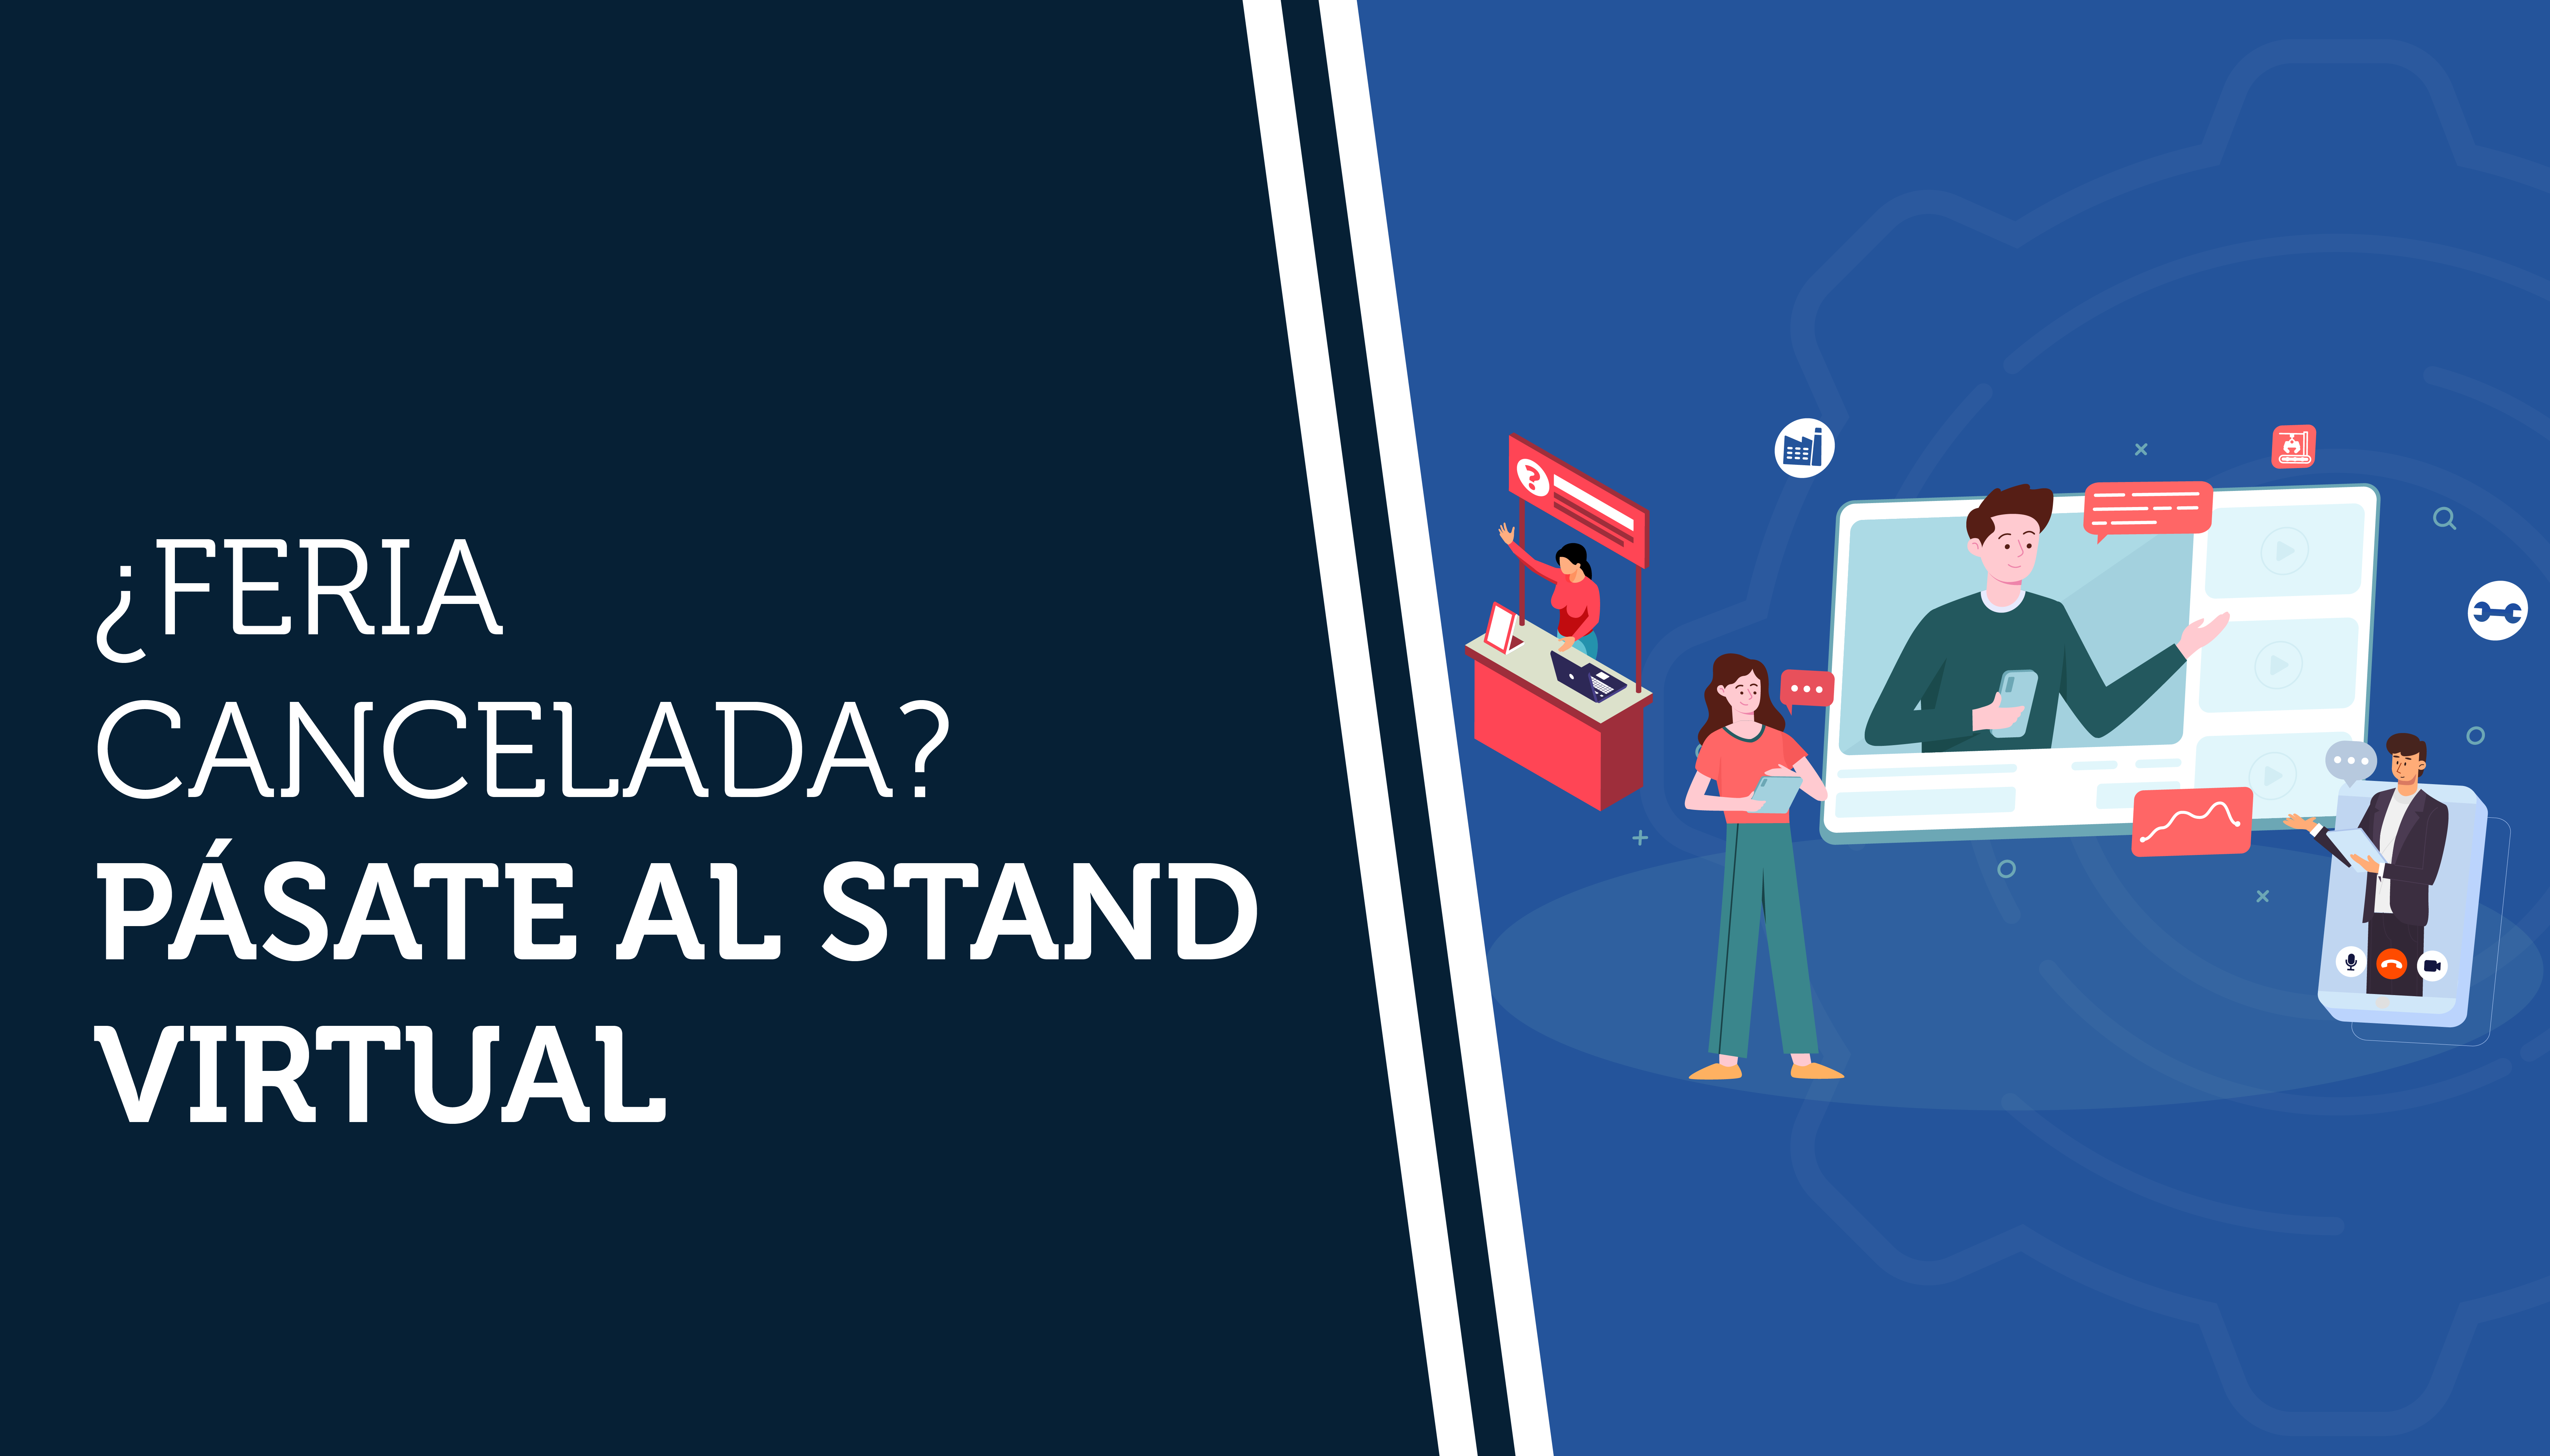 Feria-cancelada-pasate-al-stand-virtual